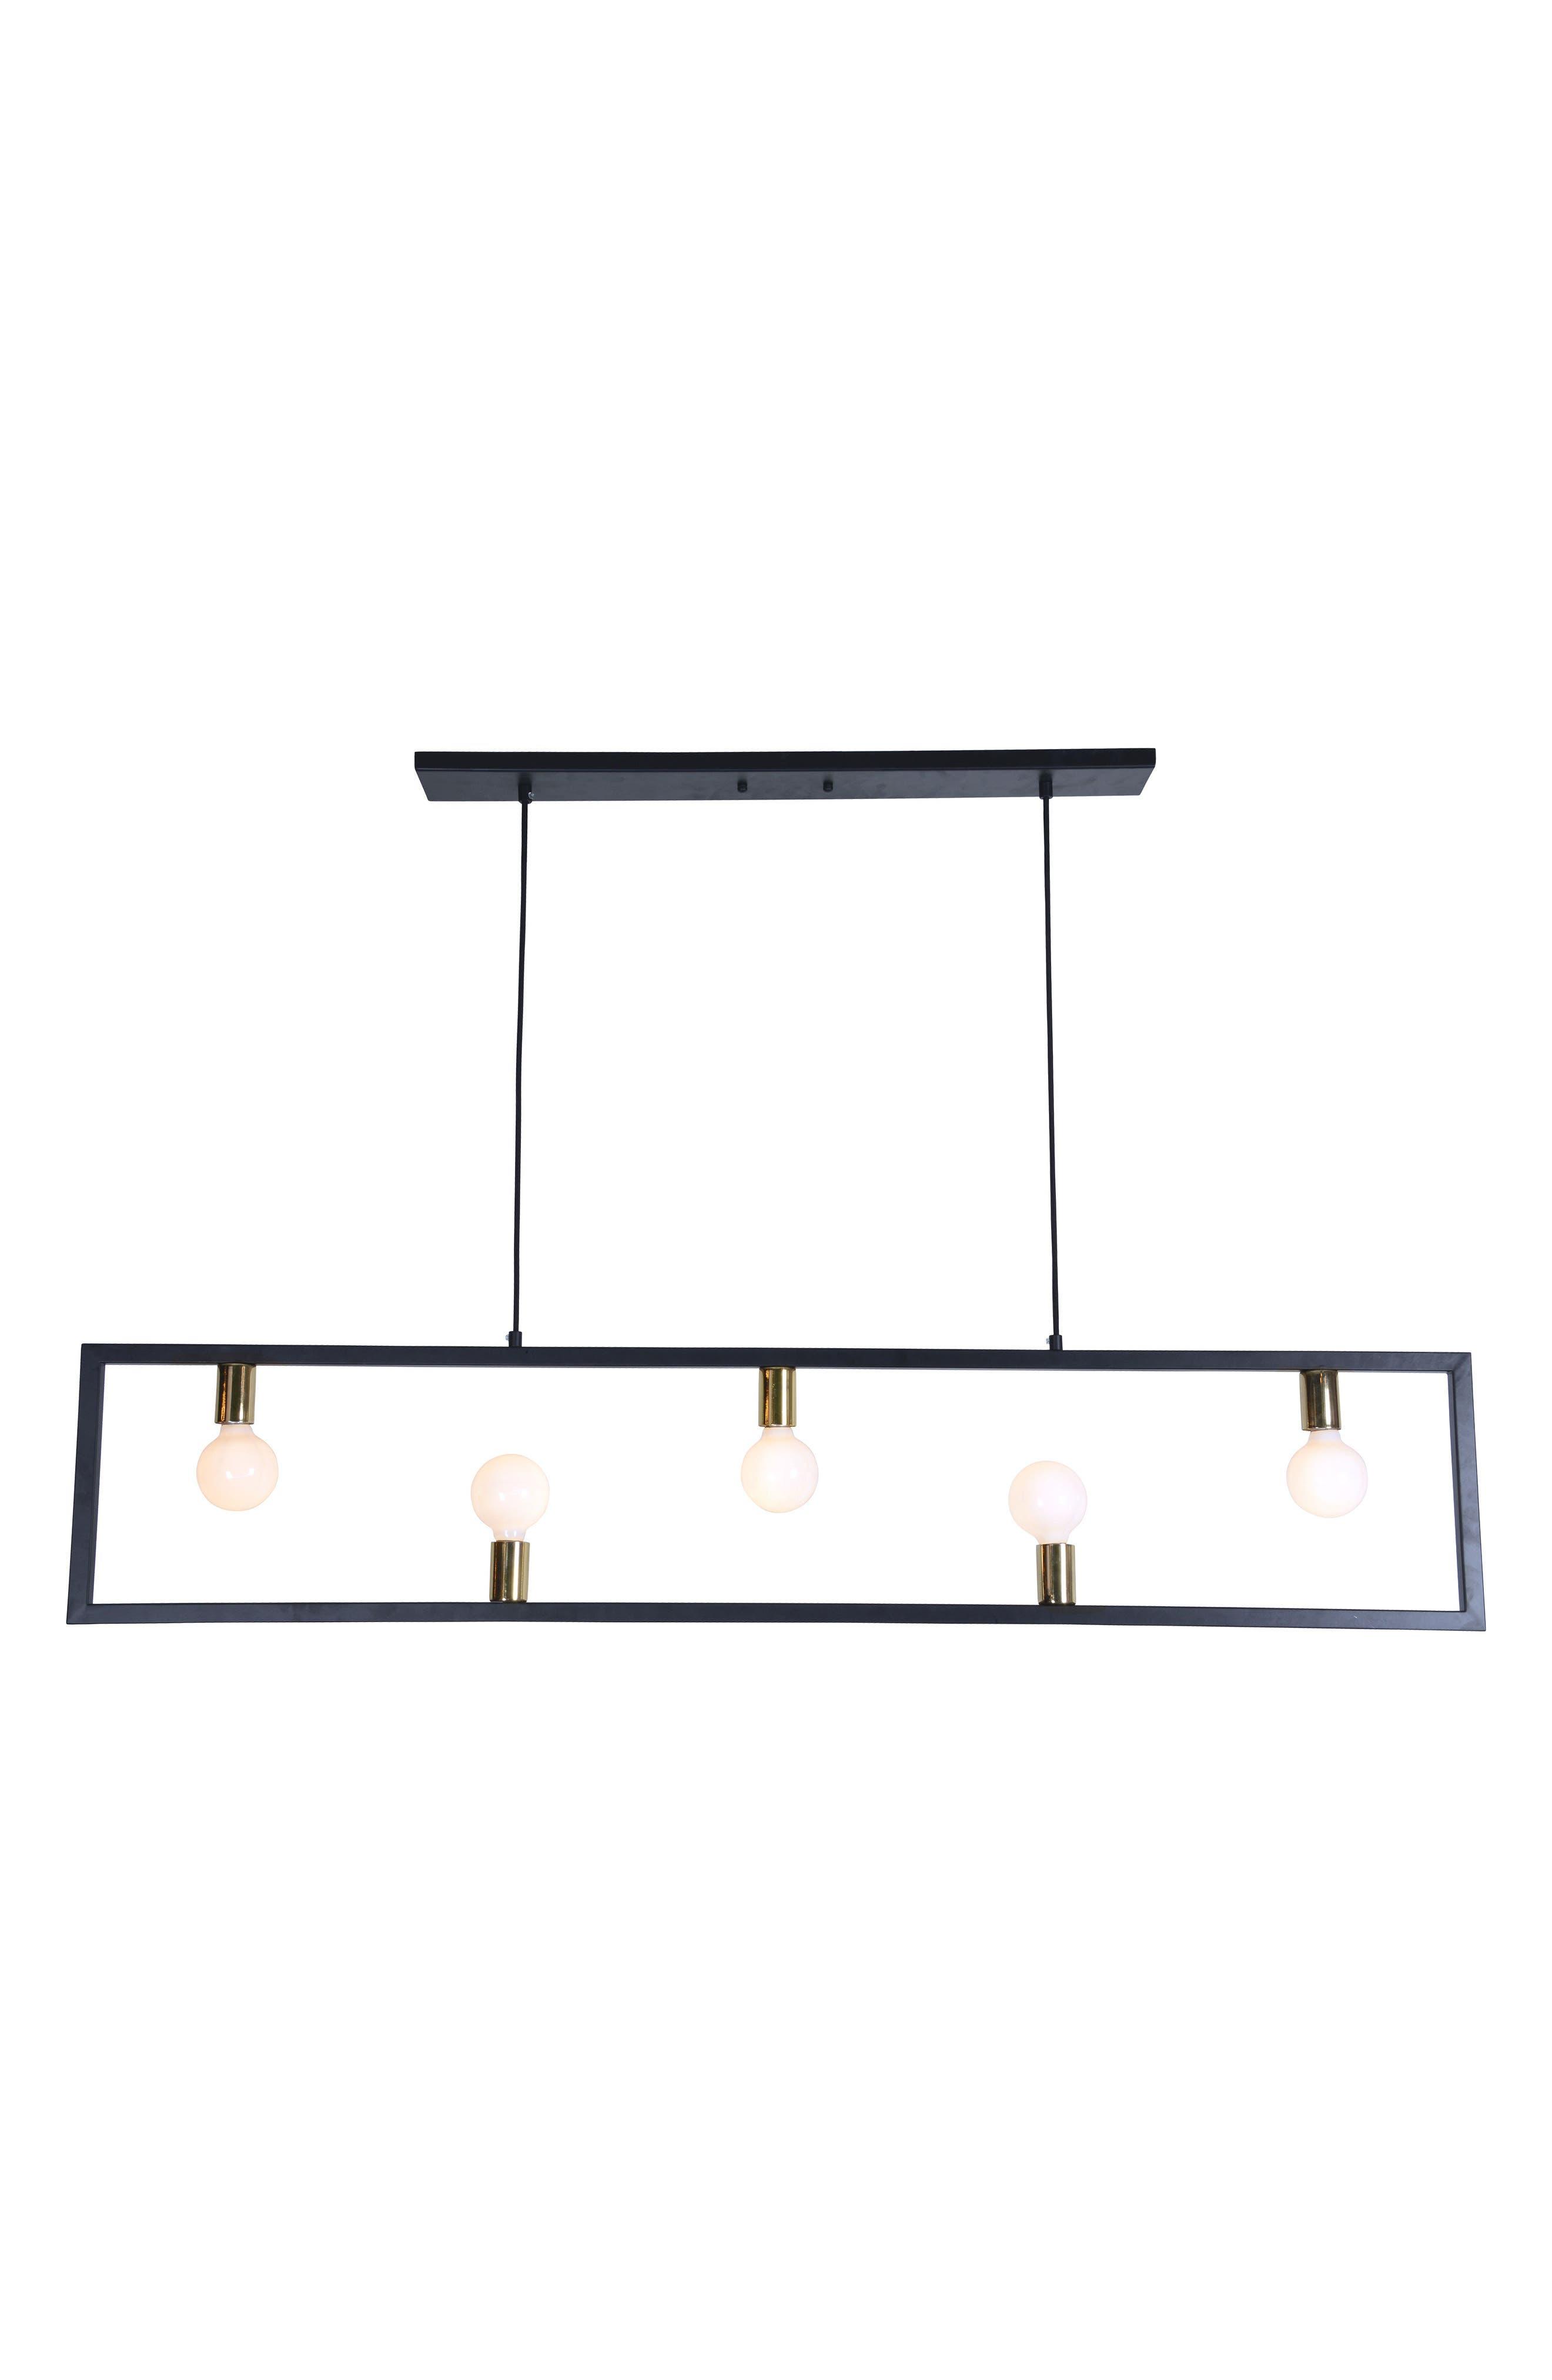 Vera Ceiling Light Fixture,                         Main,                         color, Matte Black/ Polished Brass